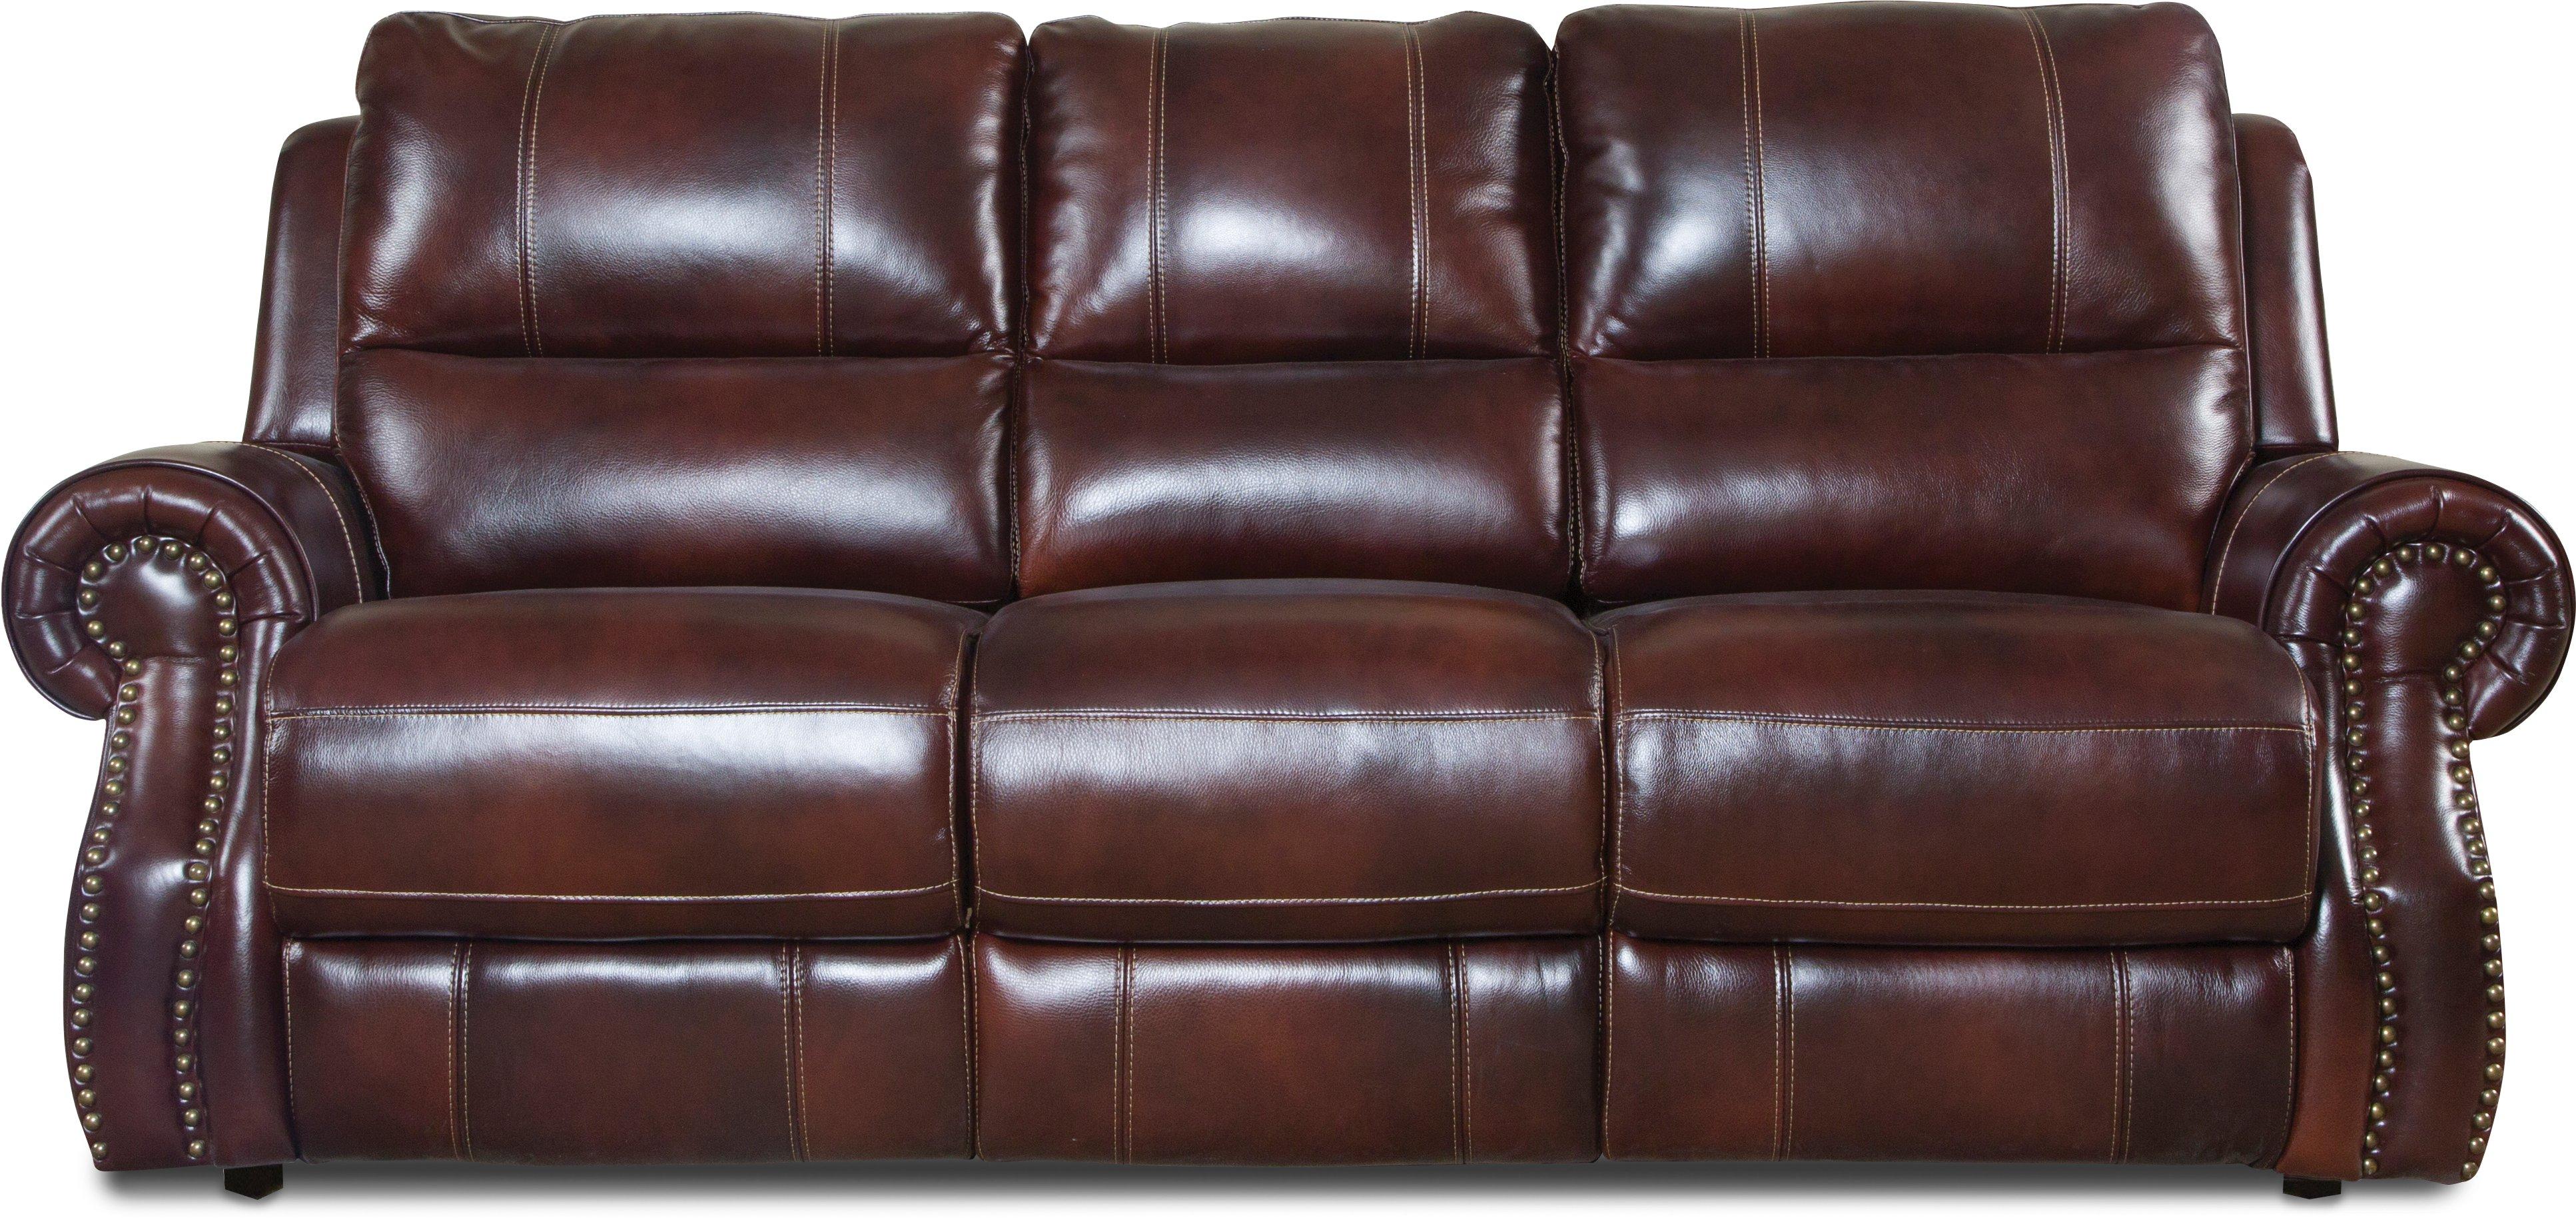 Auburn Leather Match Manual Reclining Sofa Nailhead